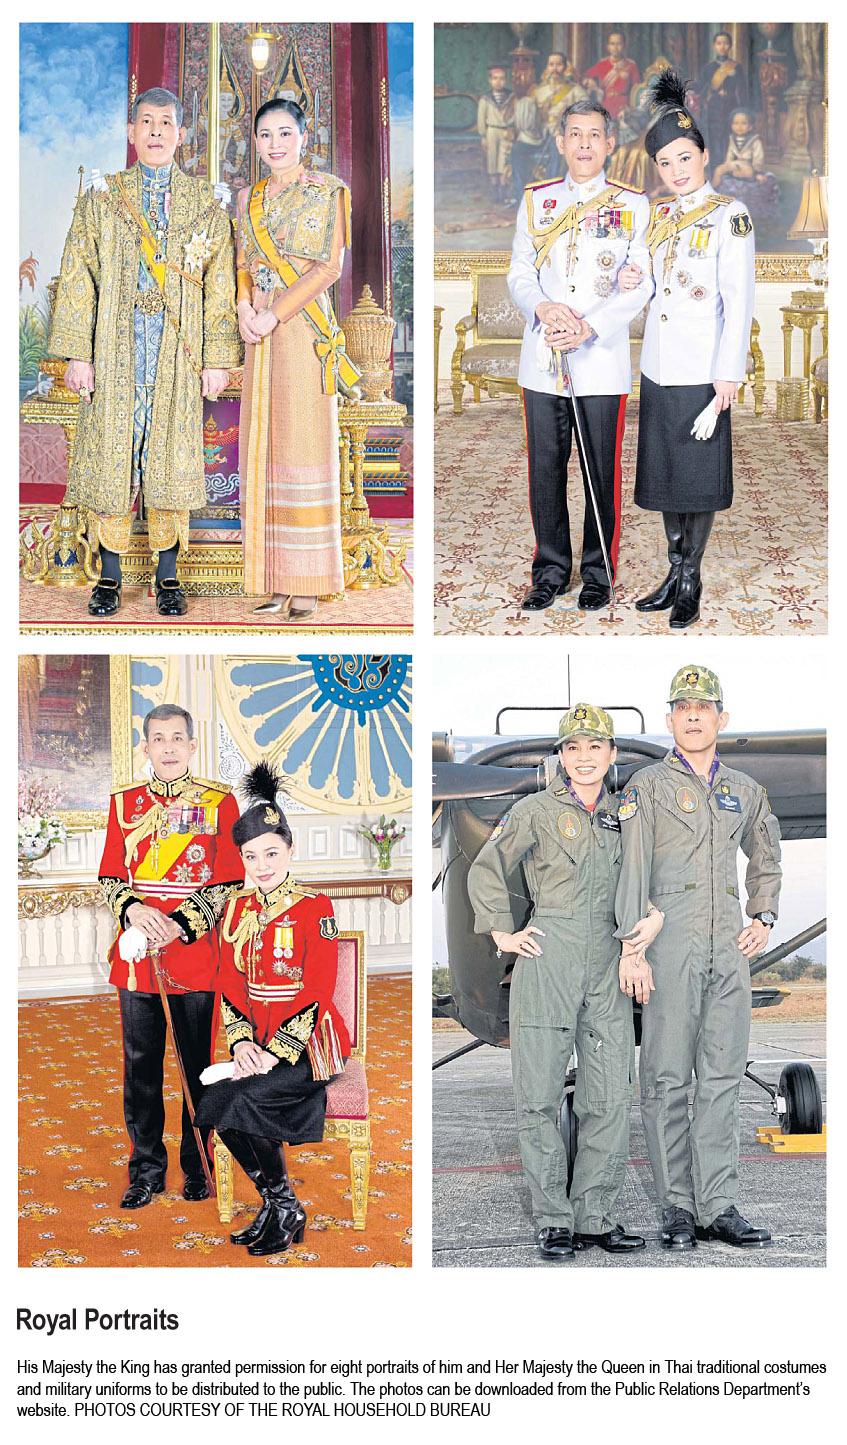 Bangkok Post 2019-05-20 Royal Portraits.jpg